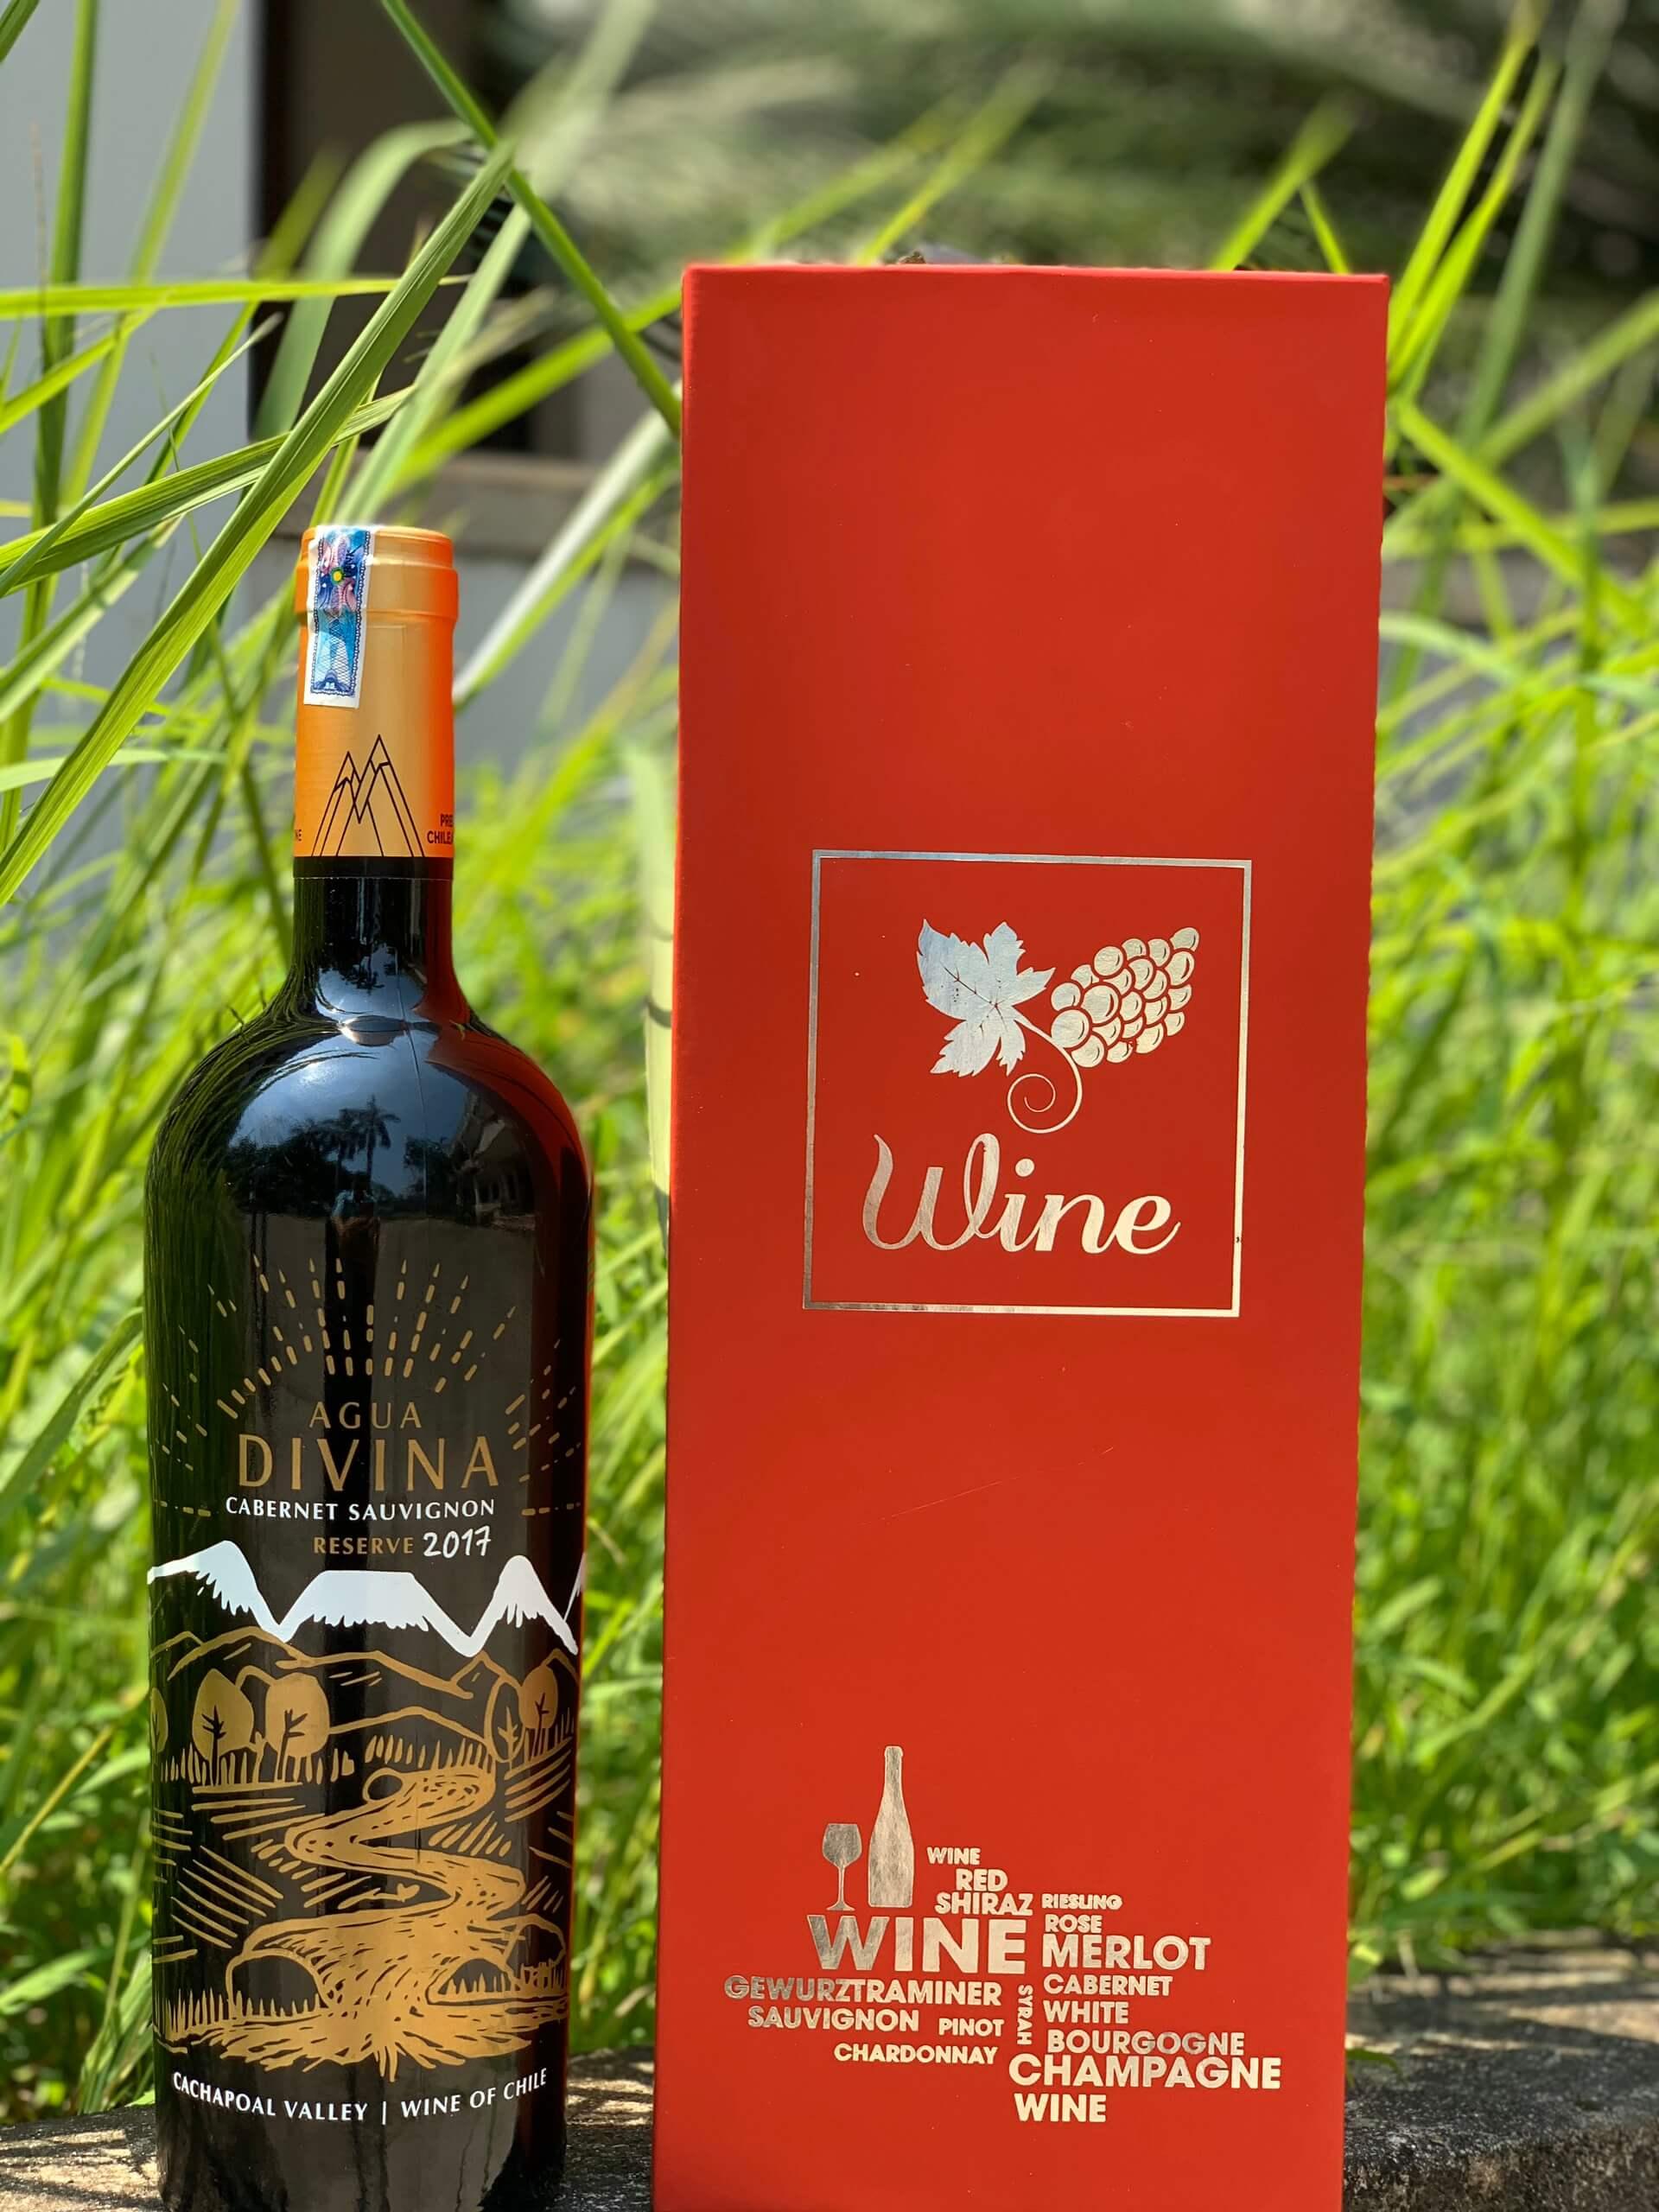 Kết quả hình ảnh cho divina agua cabernet sauvignon